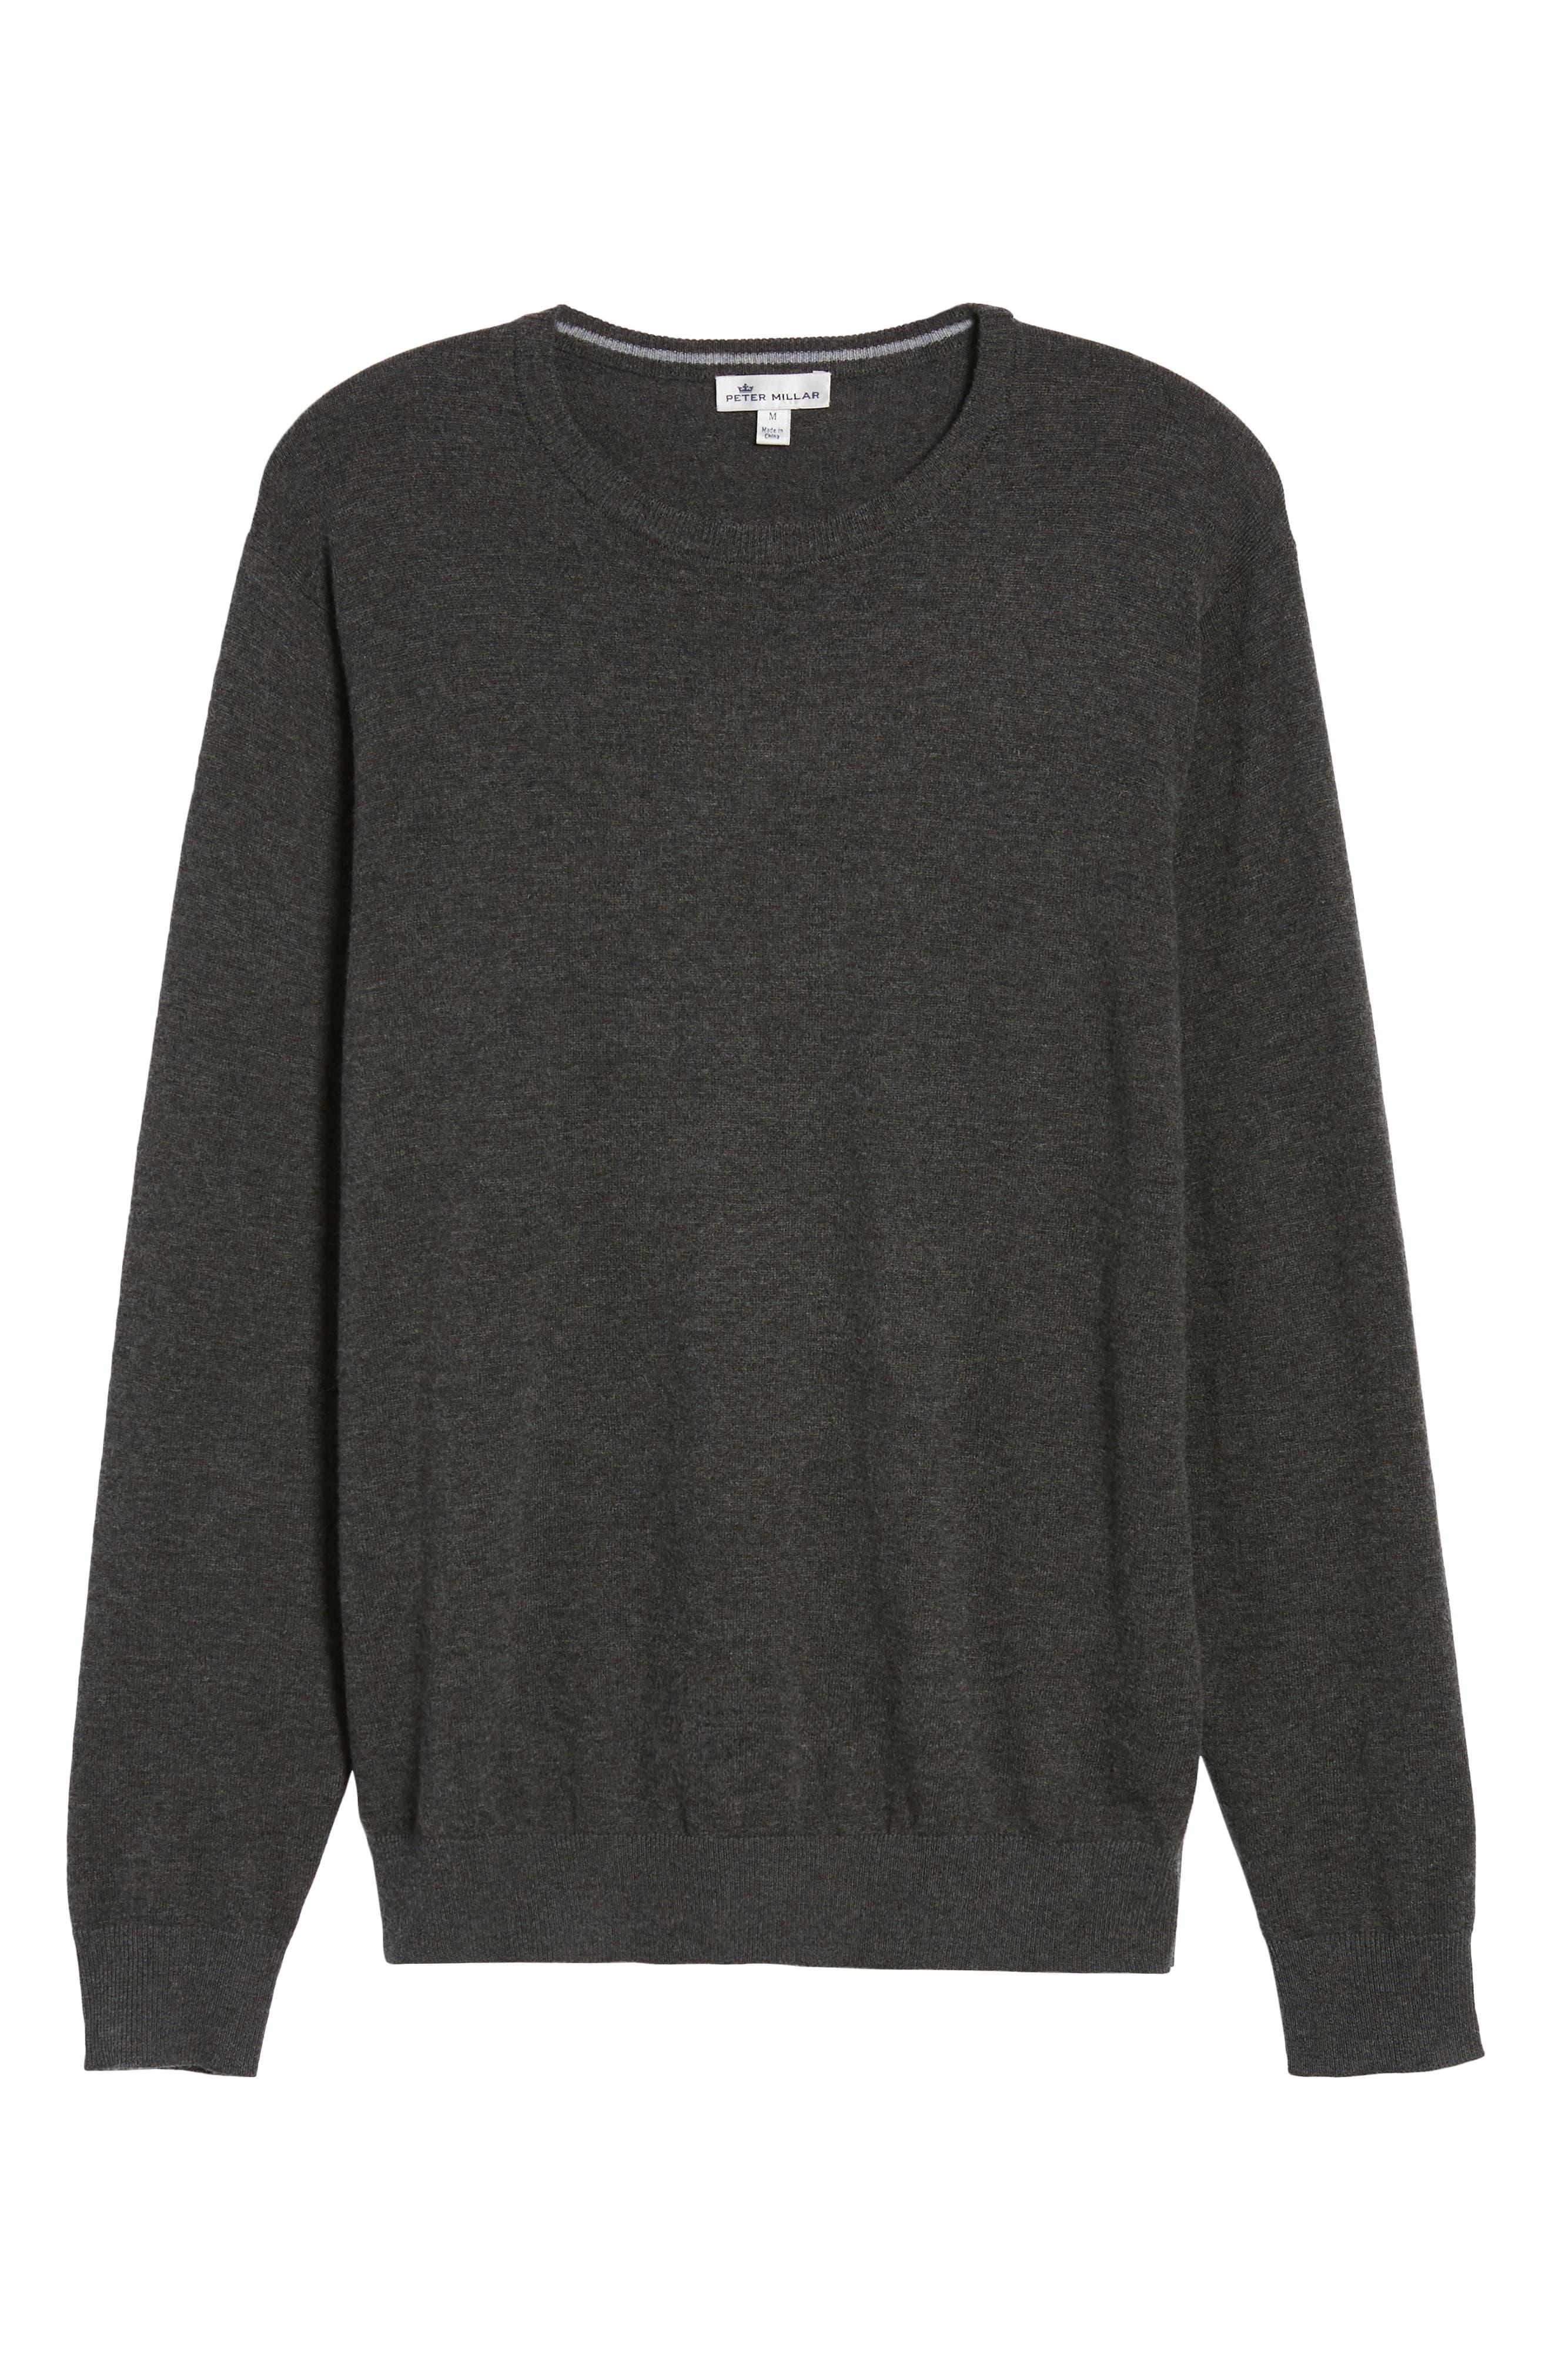 Wool & Cotton Crewneck Sweater,                             Alternate thumbnail 6, color,                             022